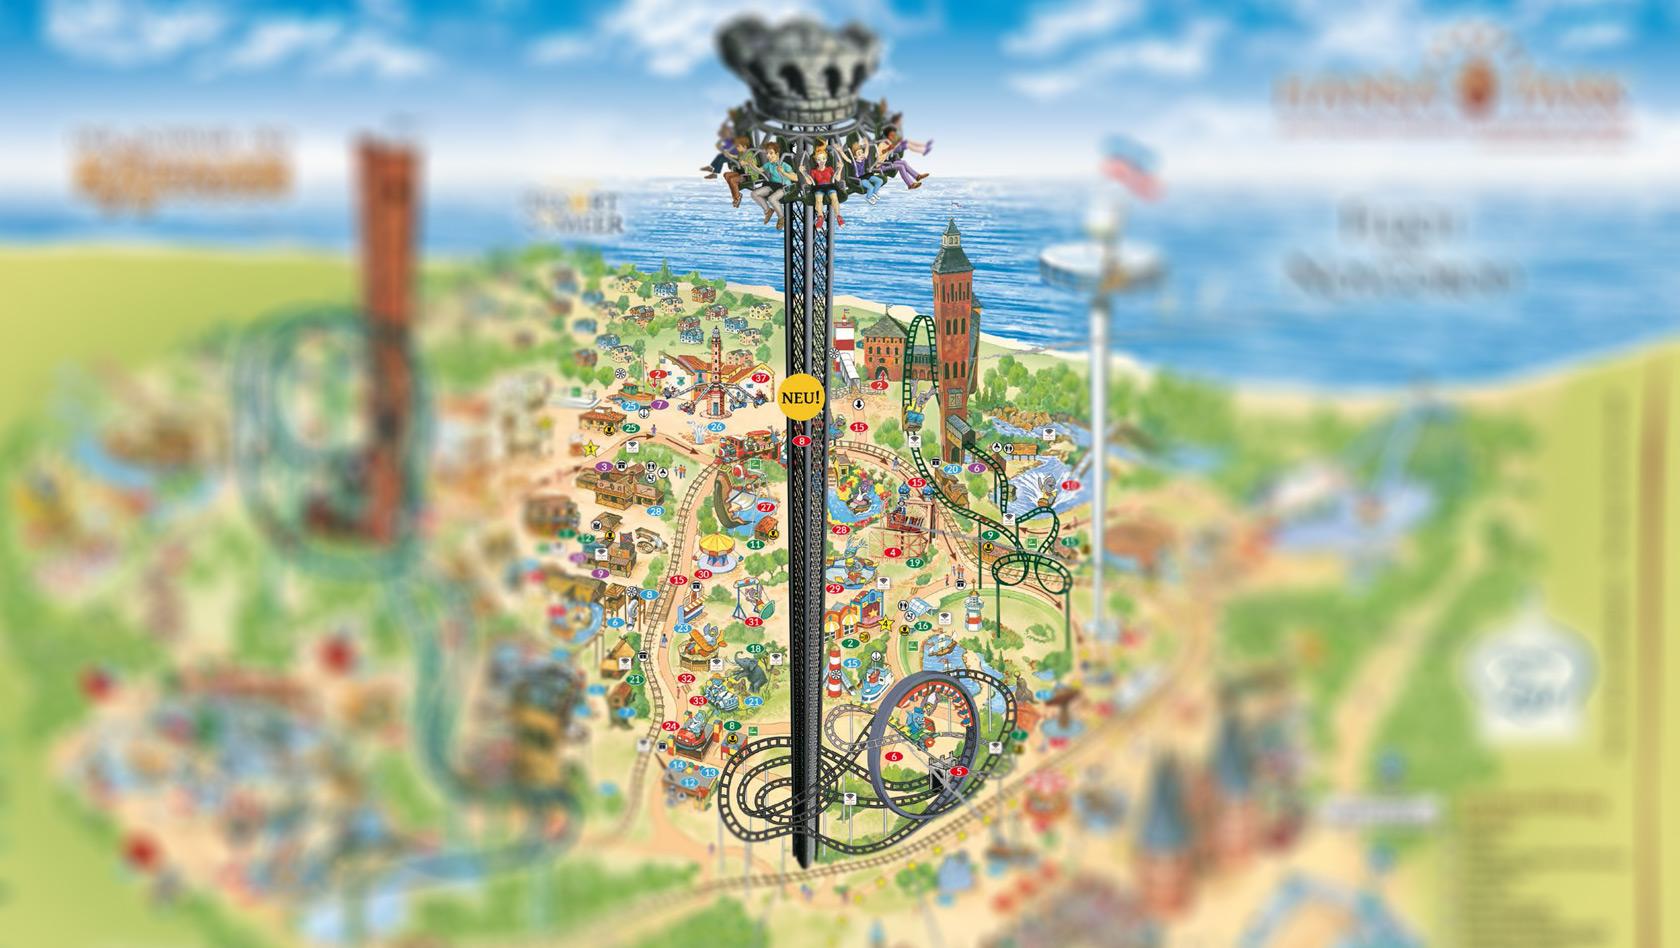 120 Meter Höhe - neuer Hansa-Park Freifallturm bricht Rekorde